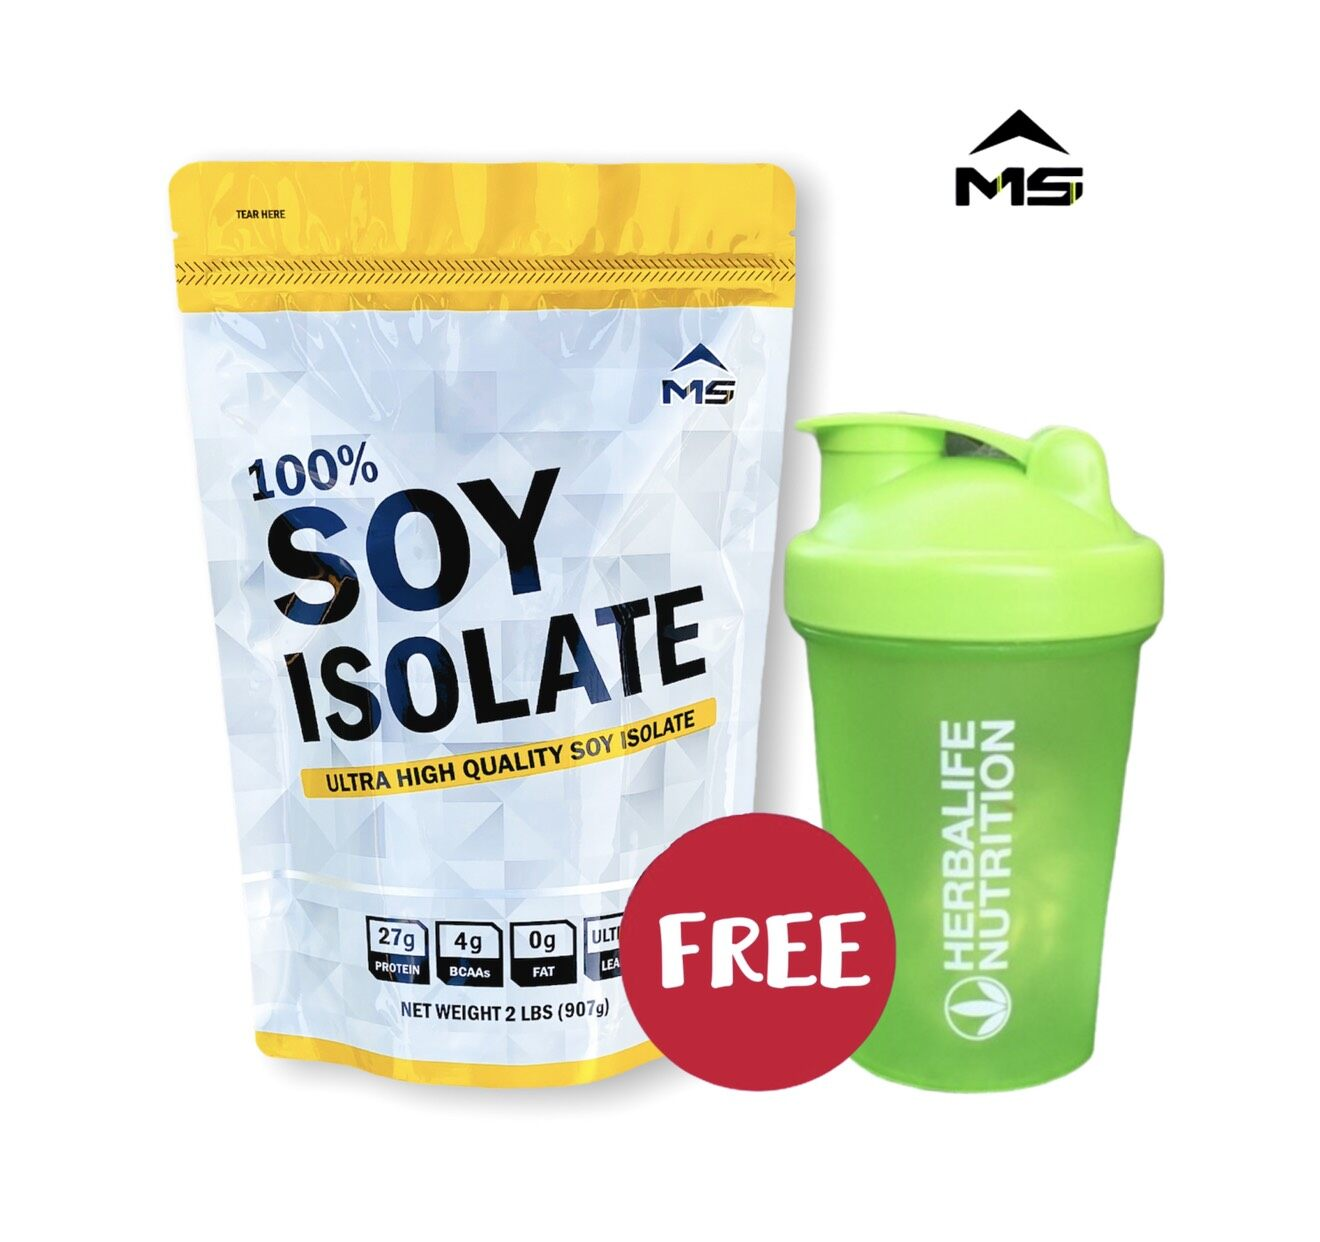 Ms Soy Protein Isolate + แก้วเช็ค(คละสี) เวย์ซอยโปรตีน โปรตีนถั่วเหลือง เวย์ถั่วเหลือง เพิ่มกล้าม ลดไขมัน สำหรับคนแพ้เวย์โปรตีนนม.